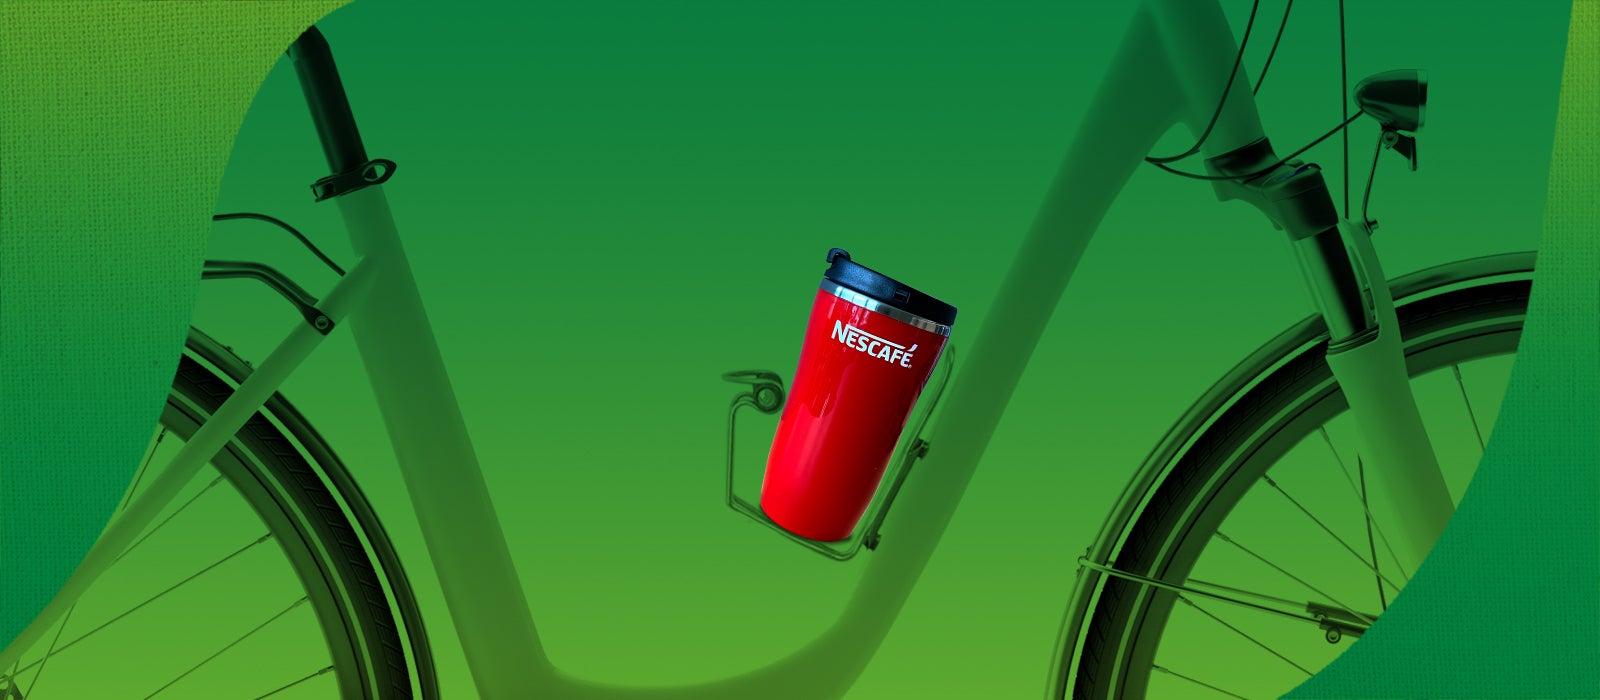 Reusable coffee cup on a bike